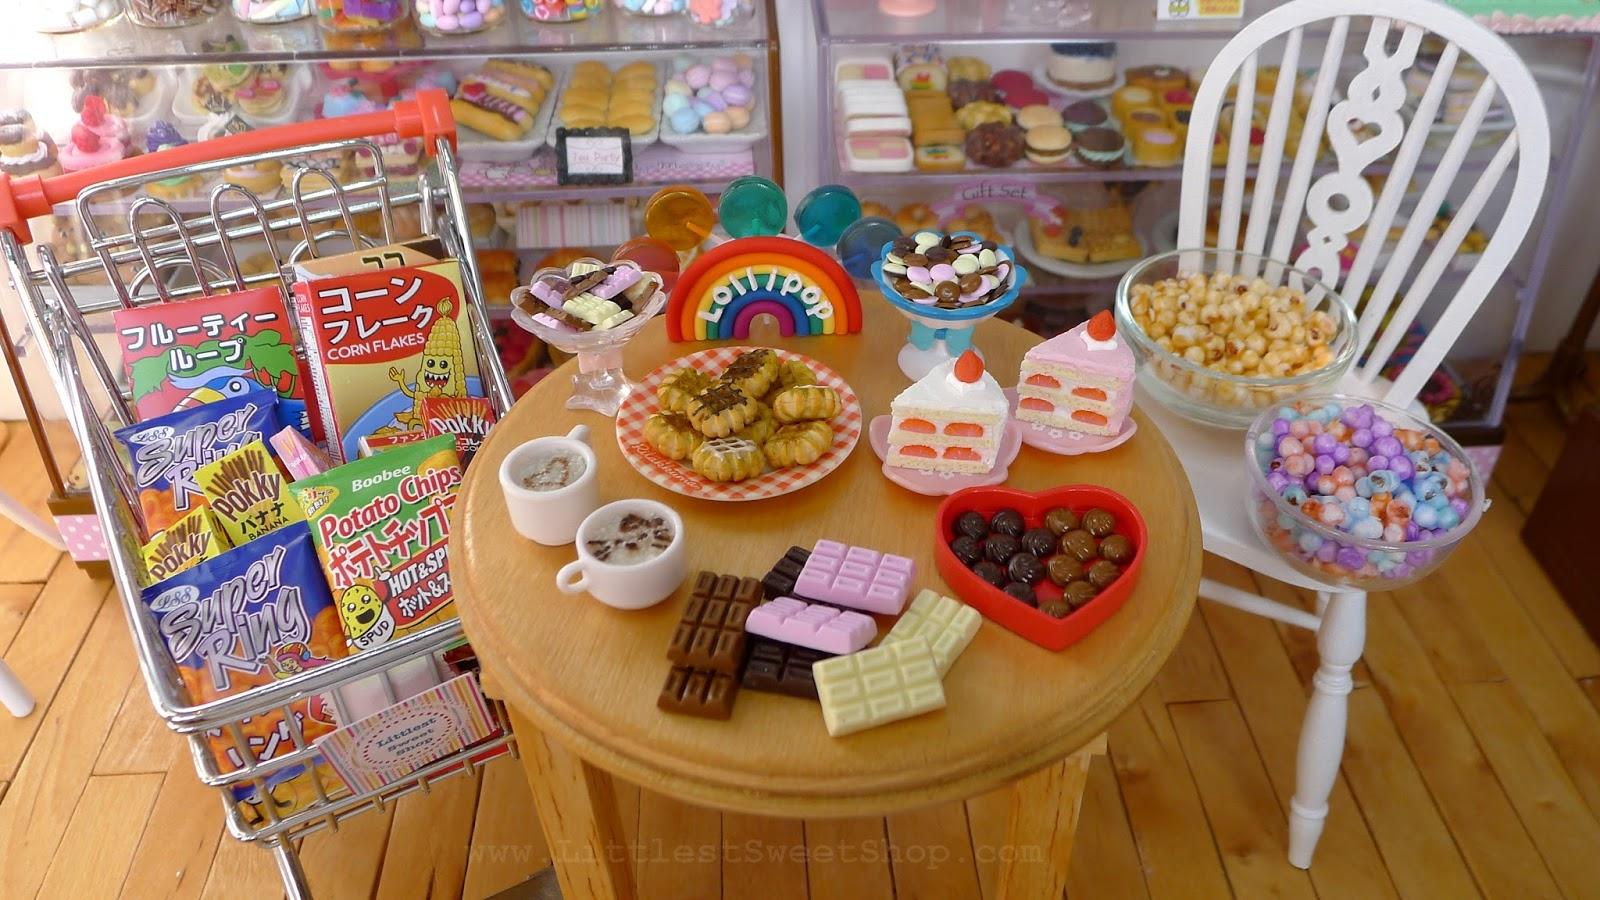 Littlest Sweet Shop: New arrivals for February - Gourmet popcorn